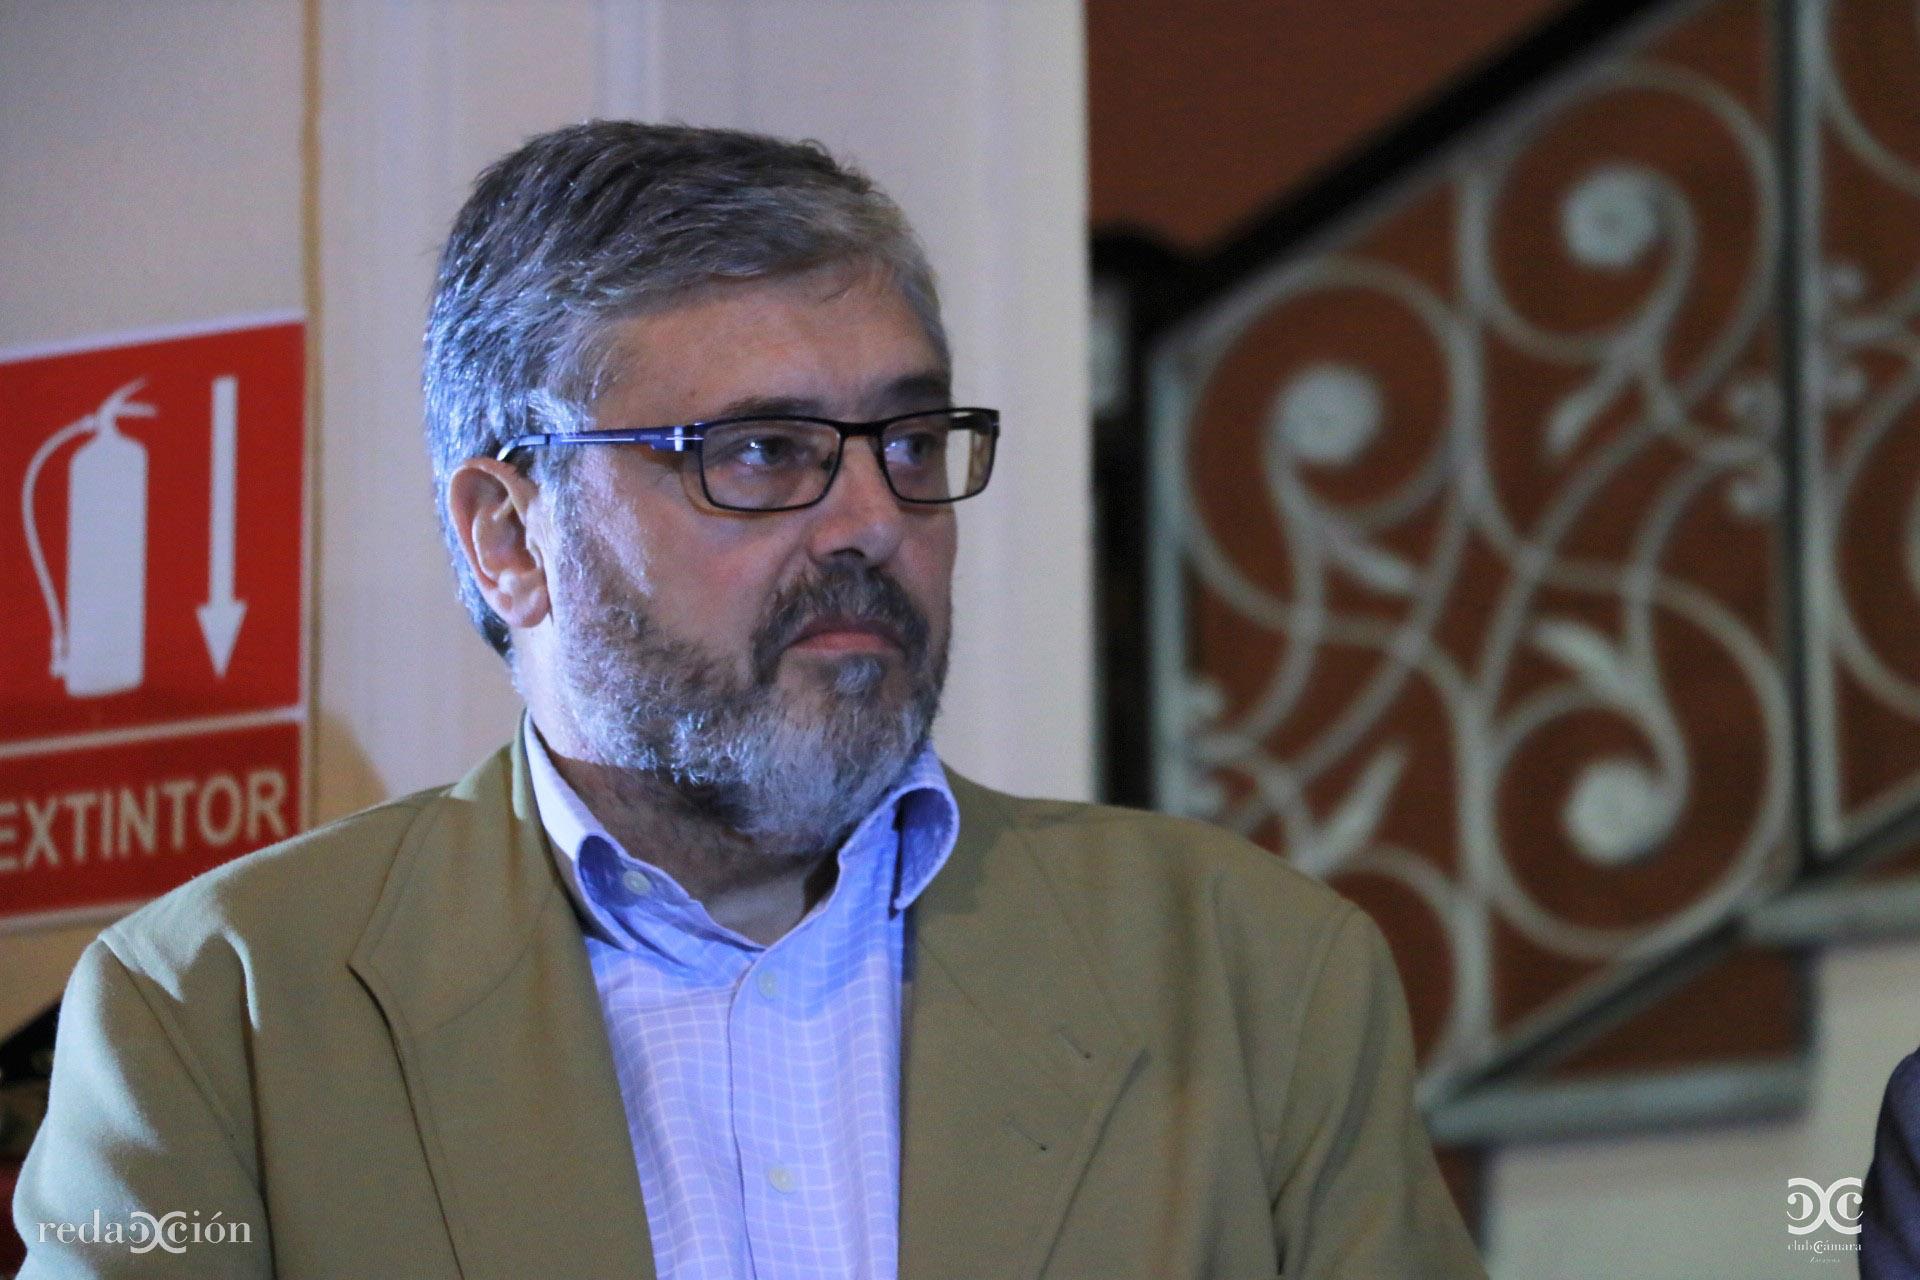 Juan Manuel Ubiergo